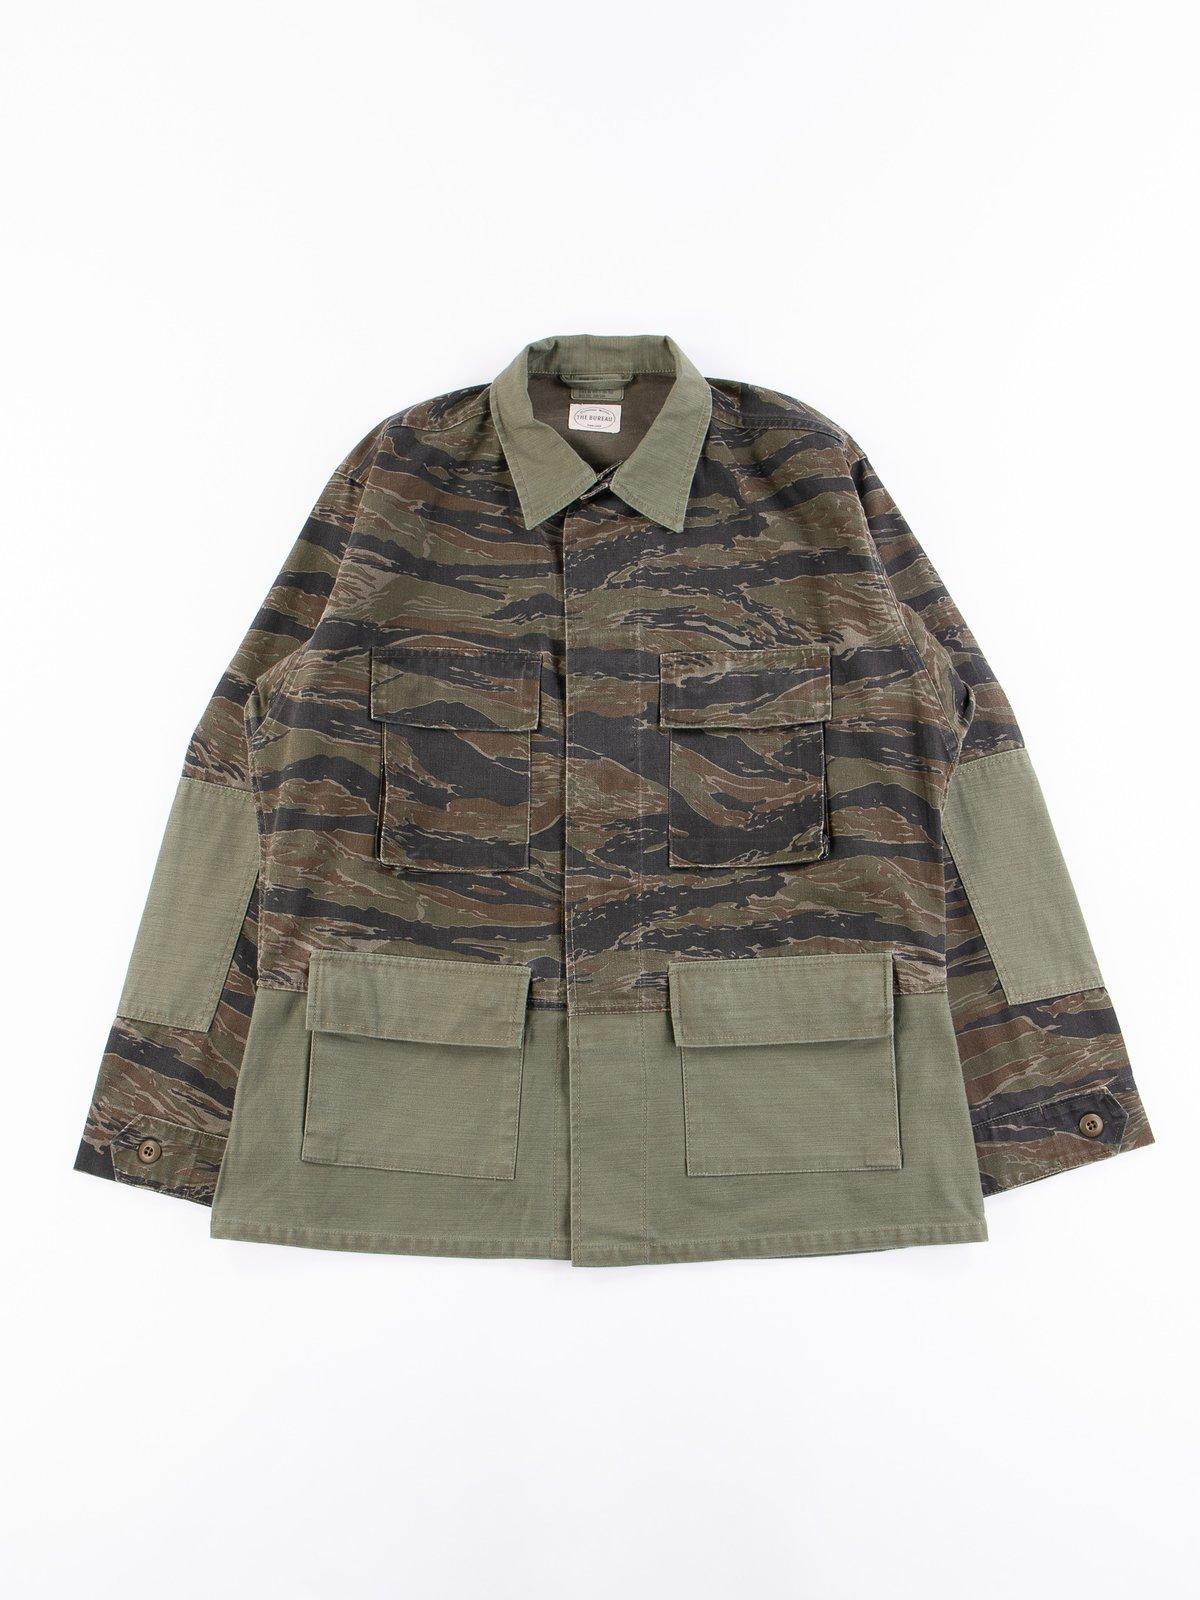 Reworks Camo/Olive Field Jacket - Image 1